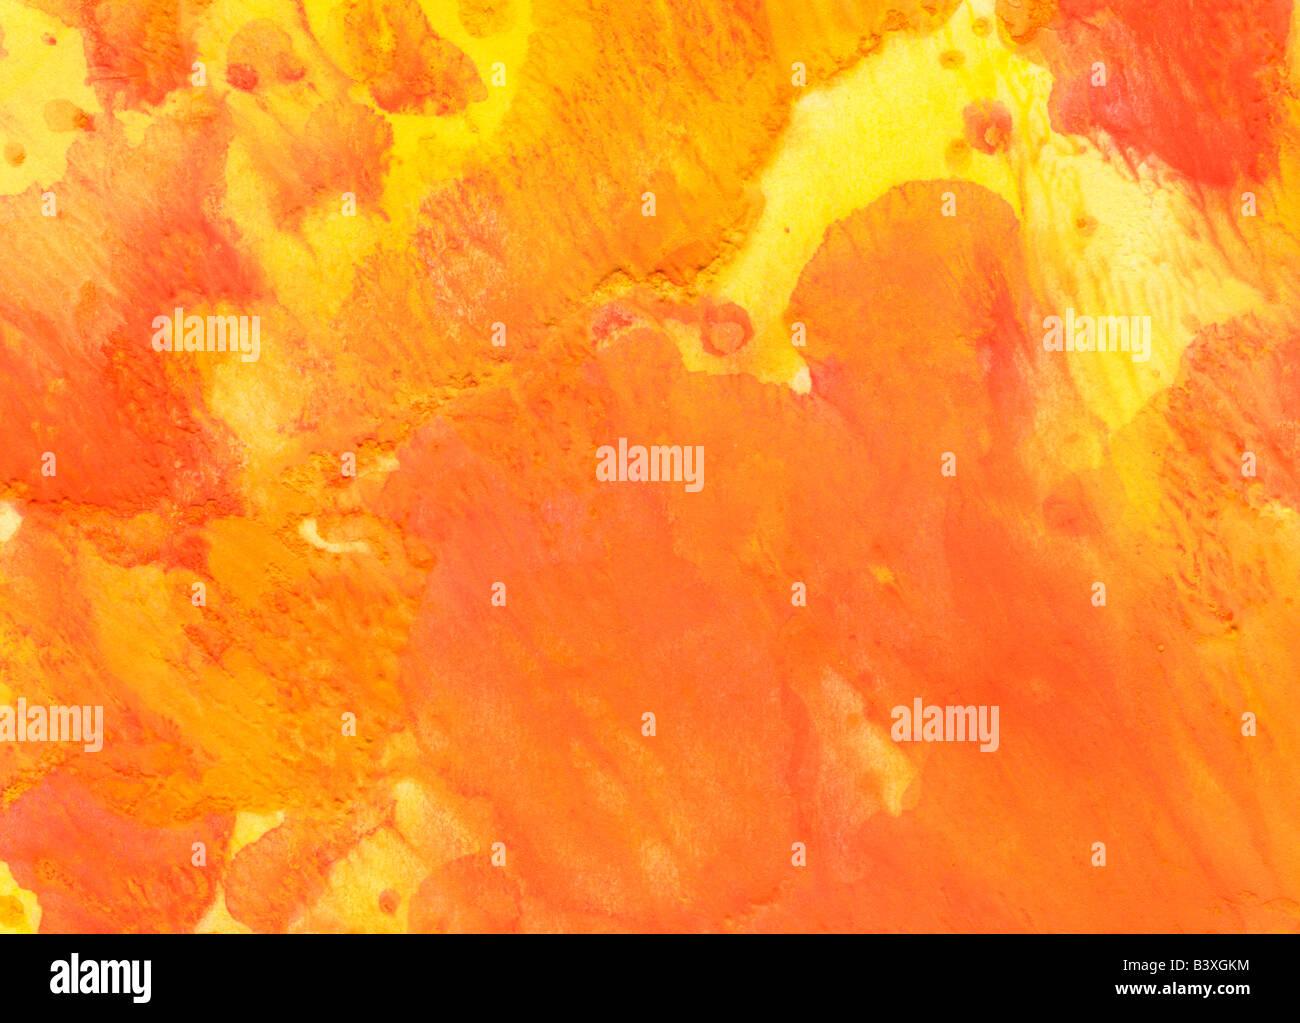 Acuarela amarillo naranja fondo de lavado Imagen De Stock